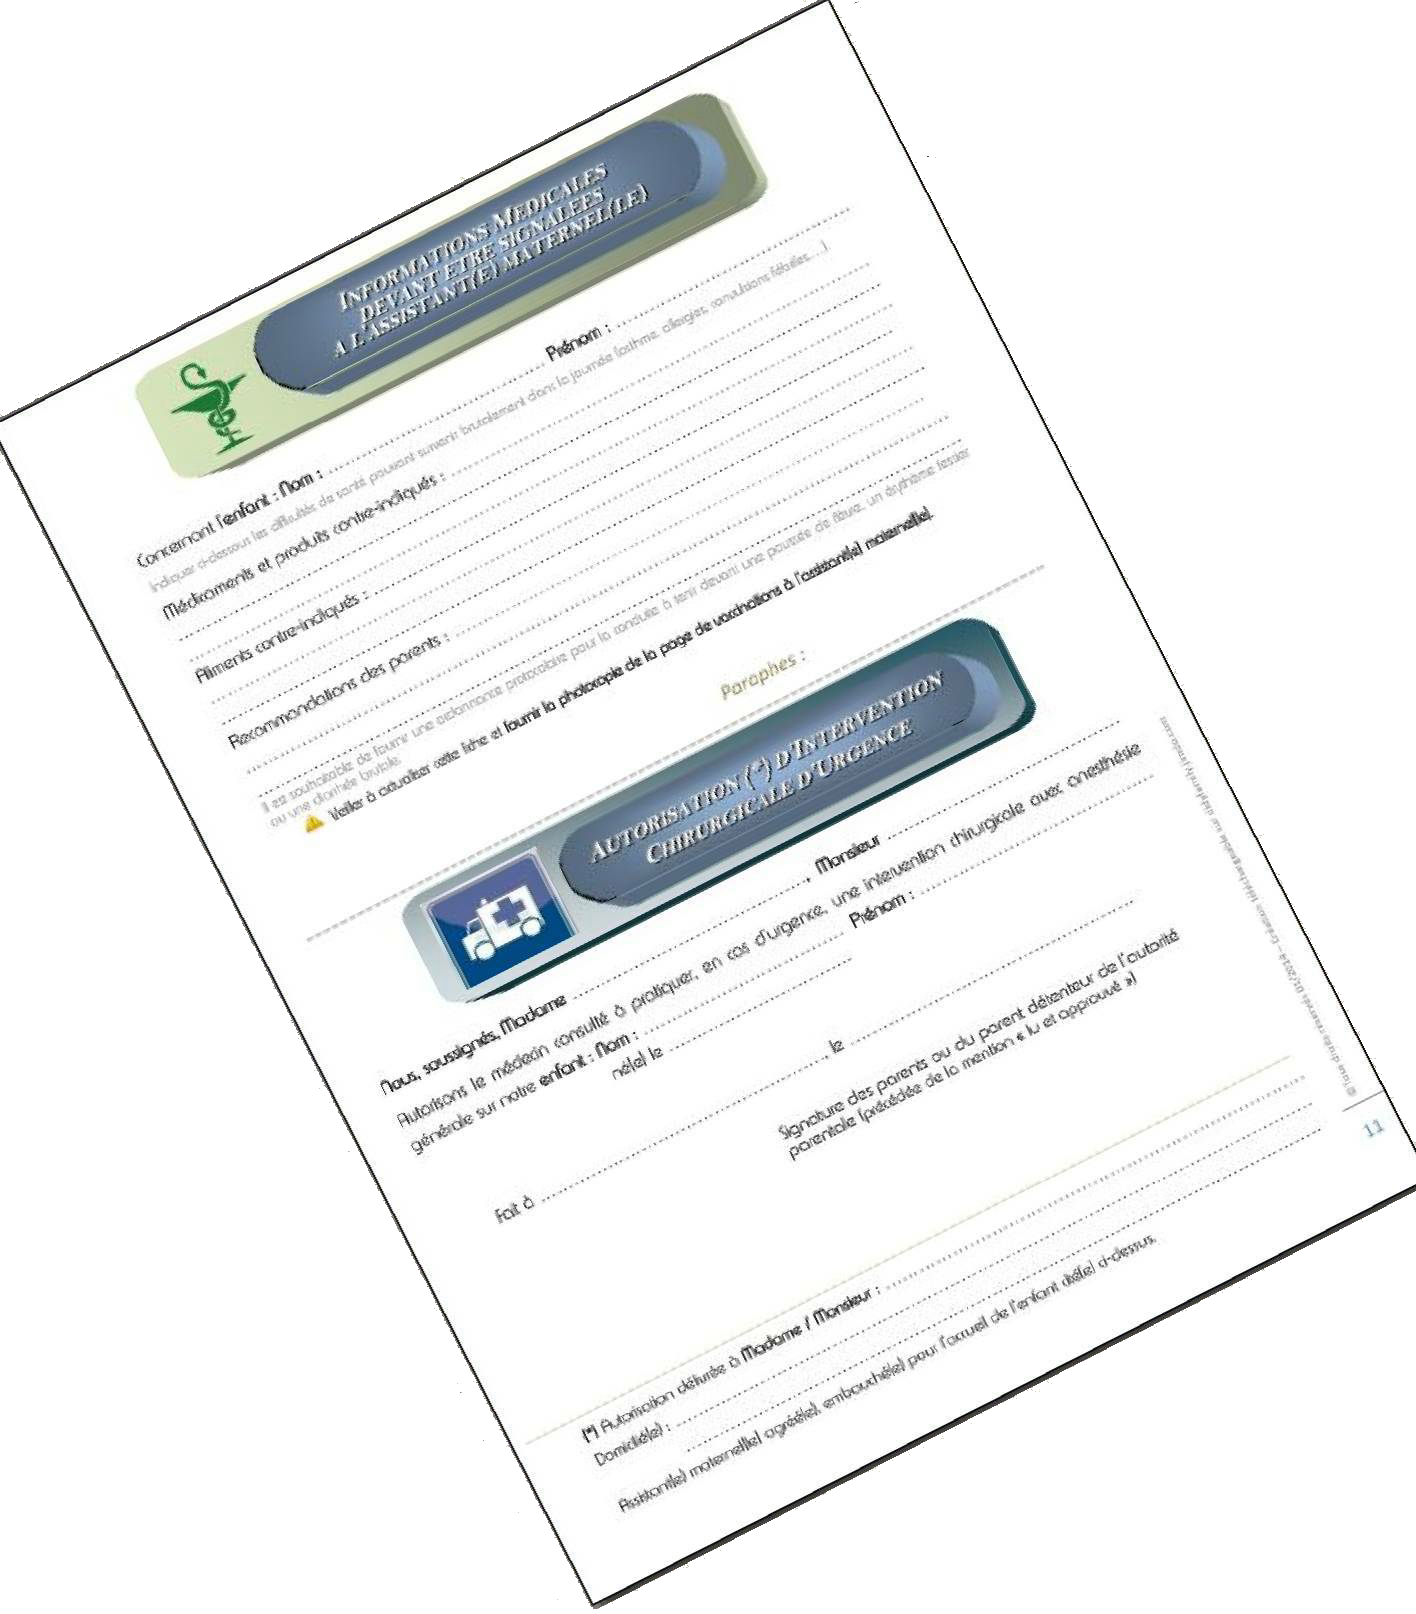 Informations médicales & Autorisation d'intervention chirurgicale d'urgence